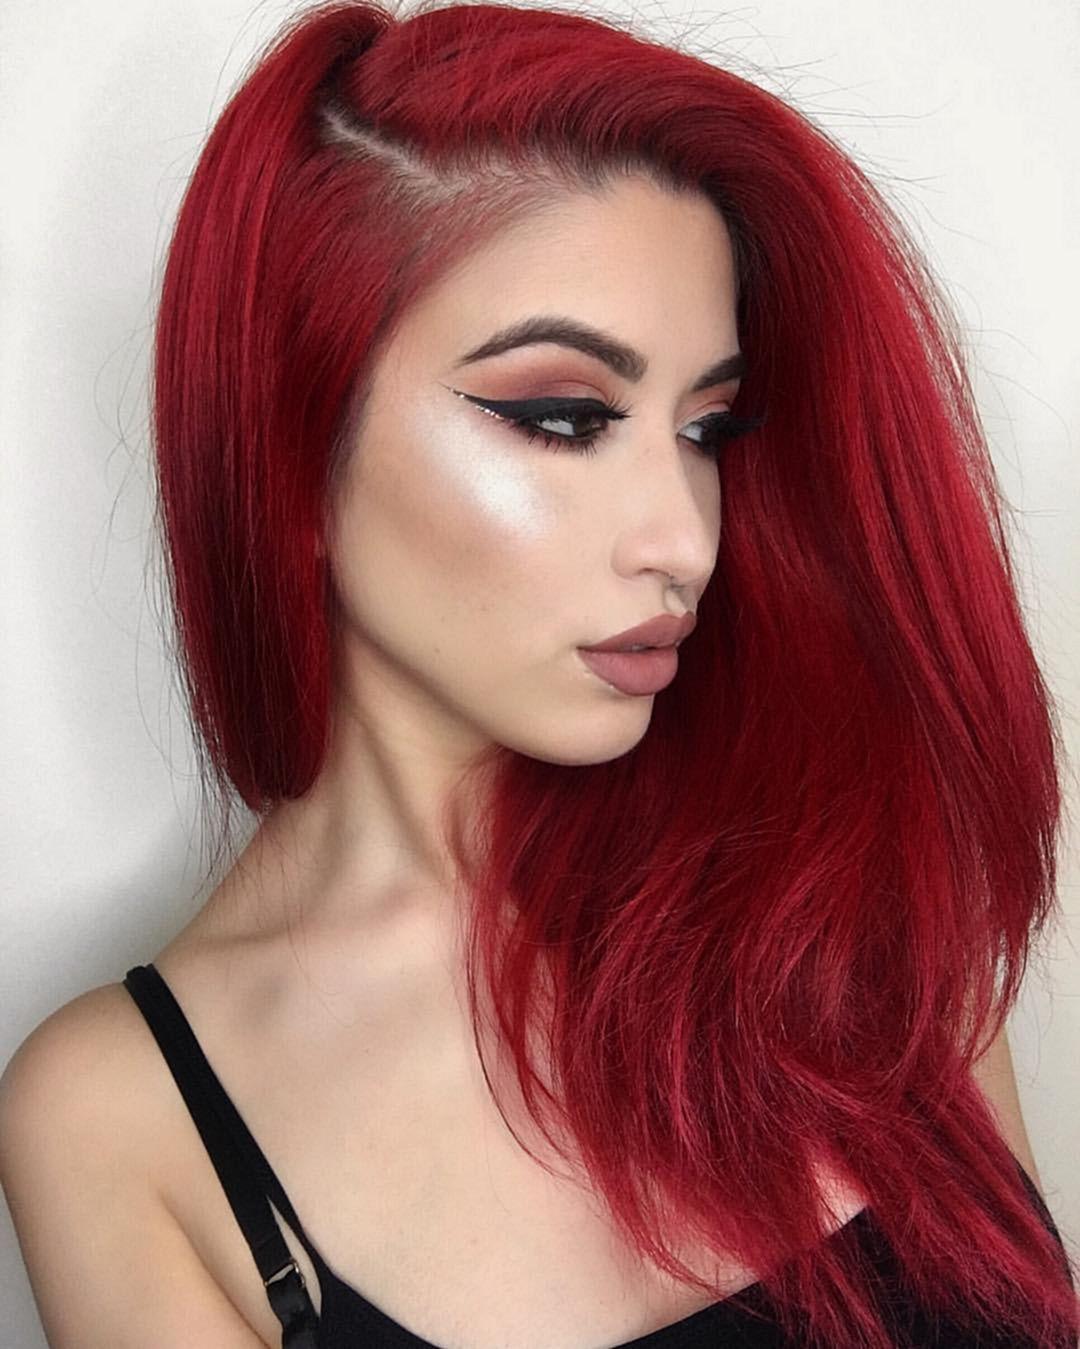 Pin by Wifey G on Fresh ta Deff V | Pinterest | Hair, Red ...